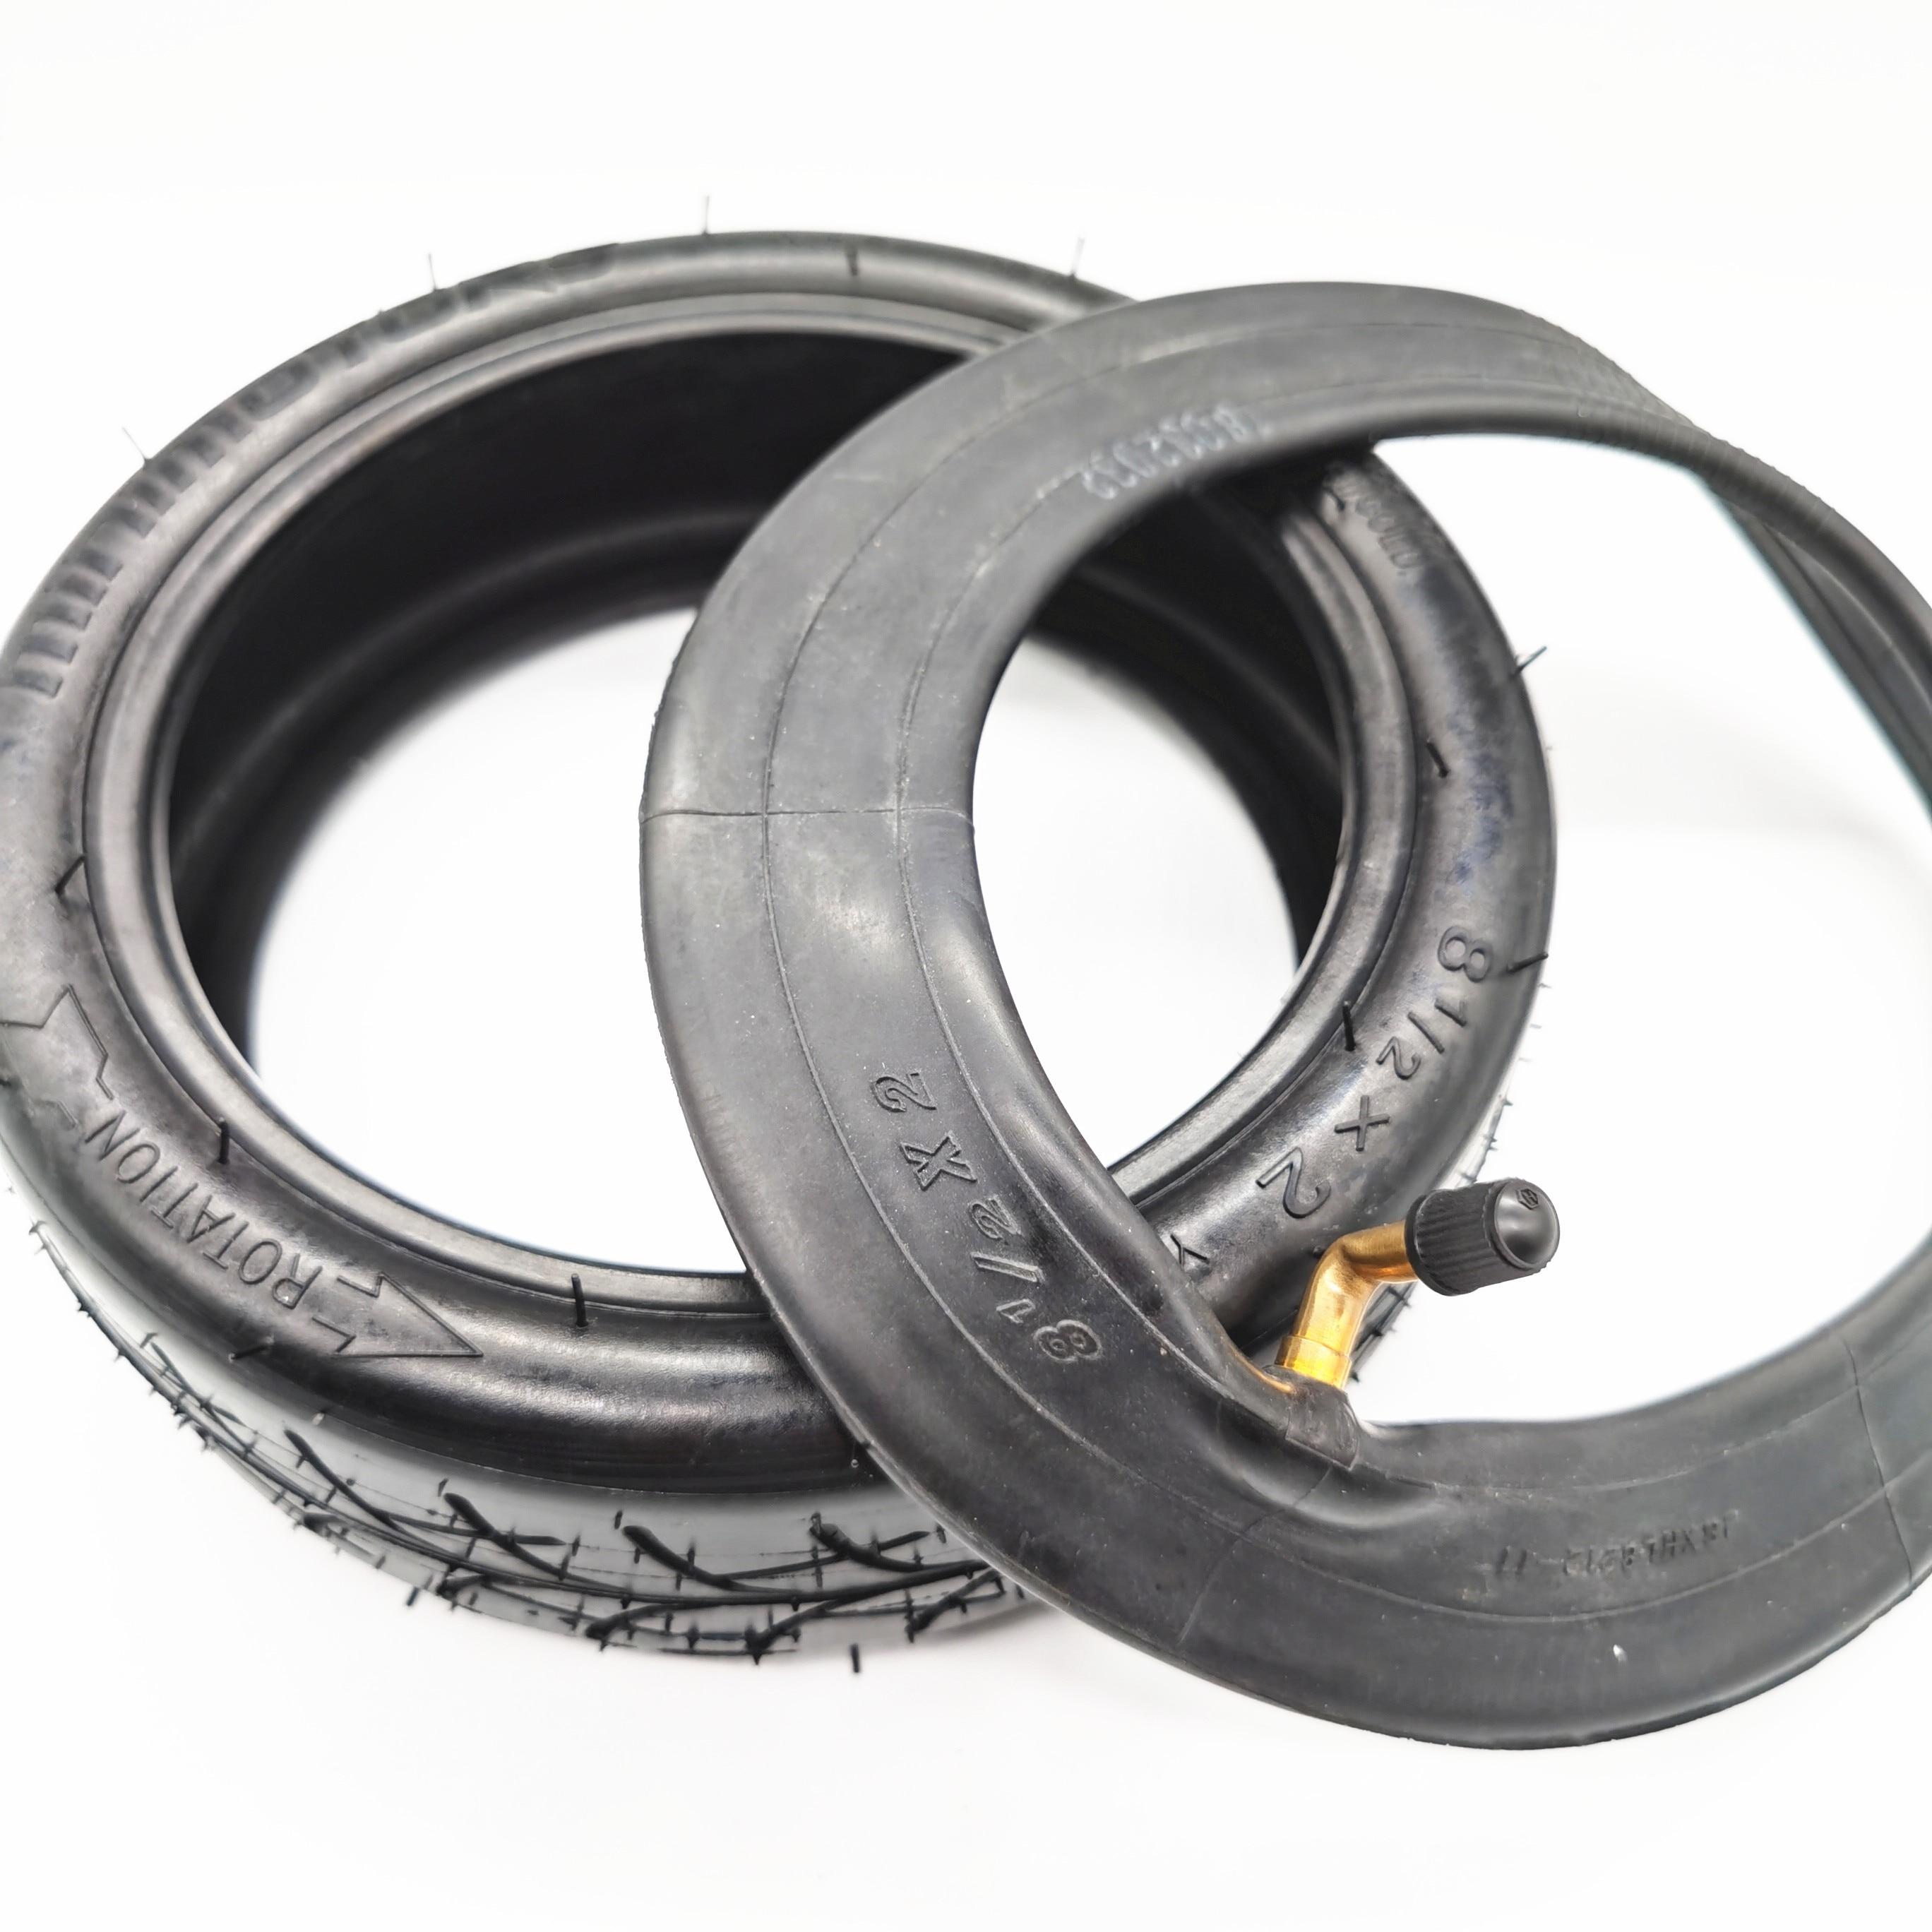 Pneu de dualtron mini dtmini leger elétrico scooter tubo encantador pneu